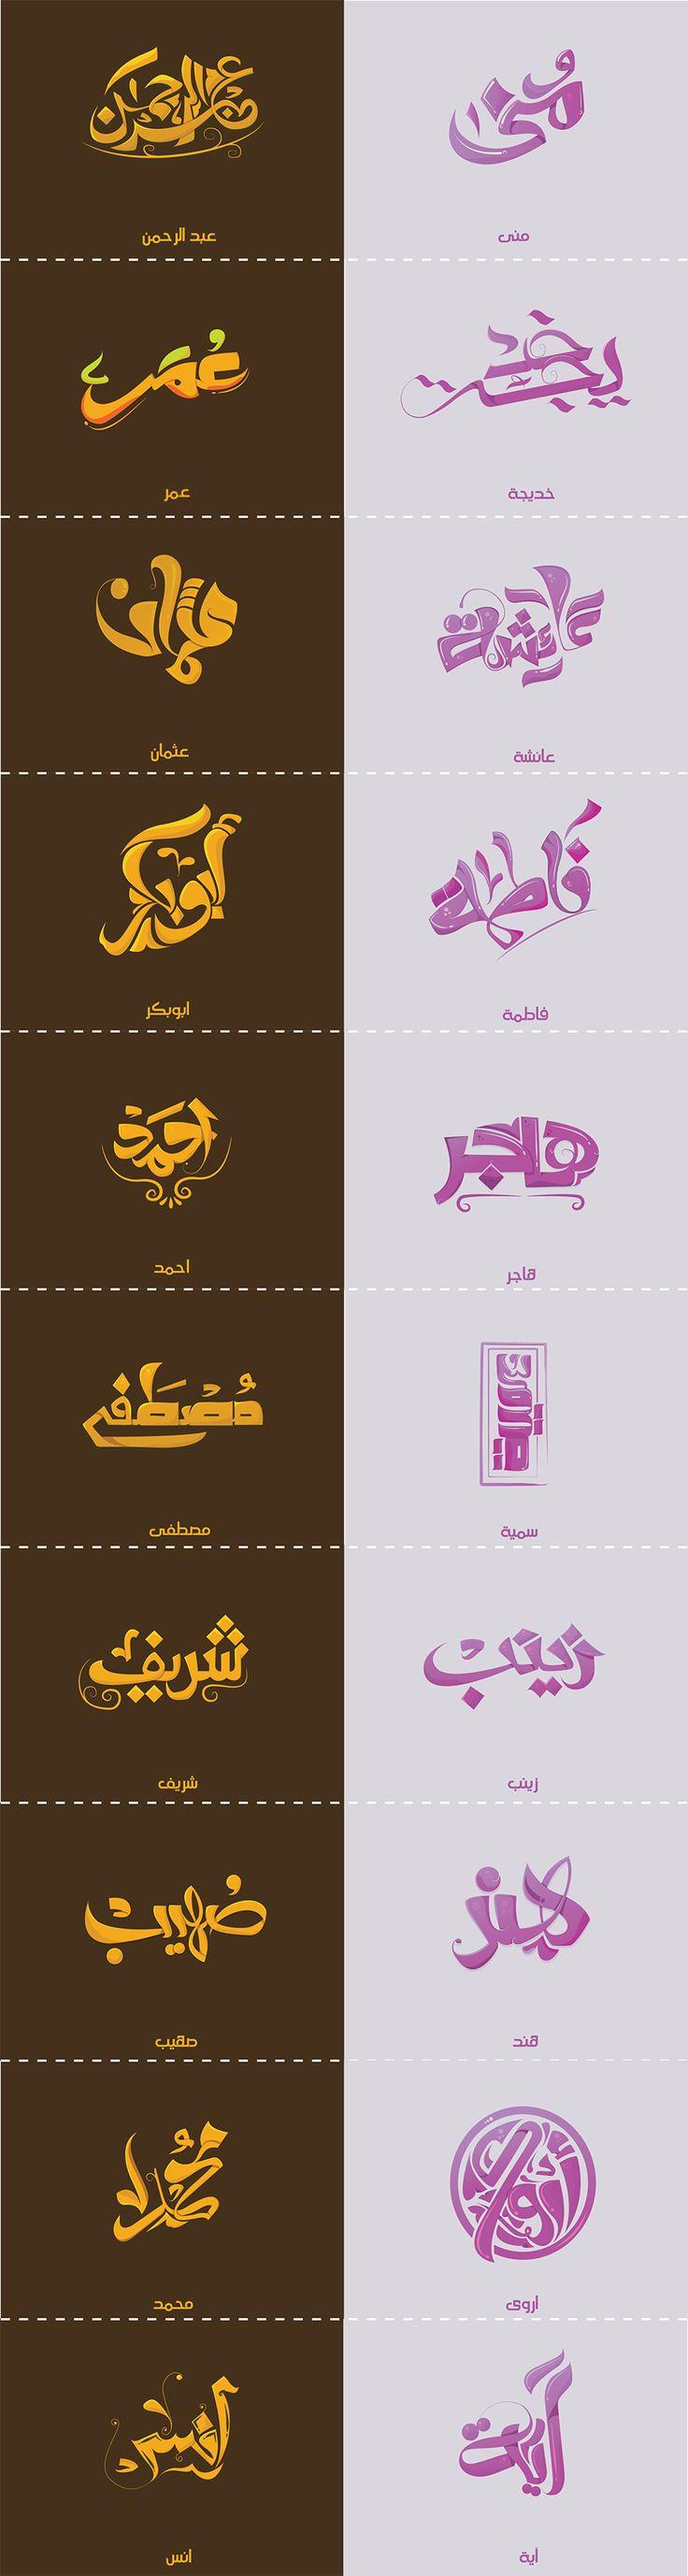 20 Arabic Typography Names on Behance